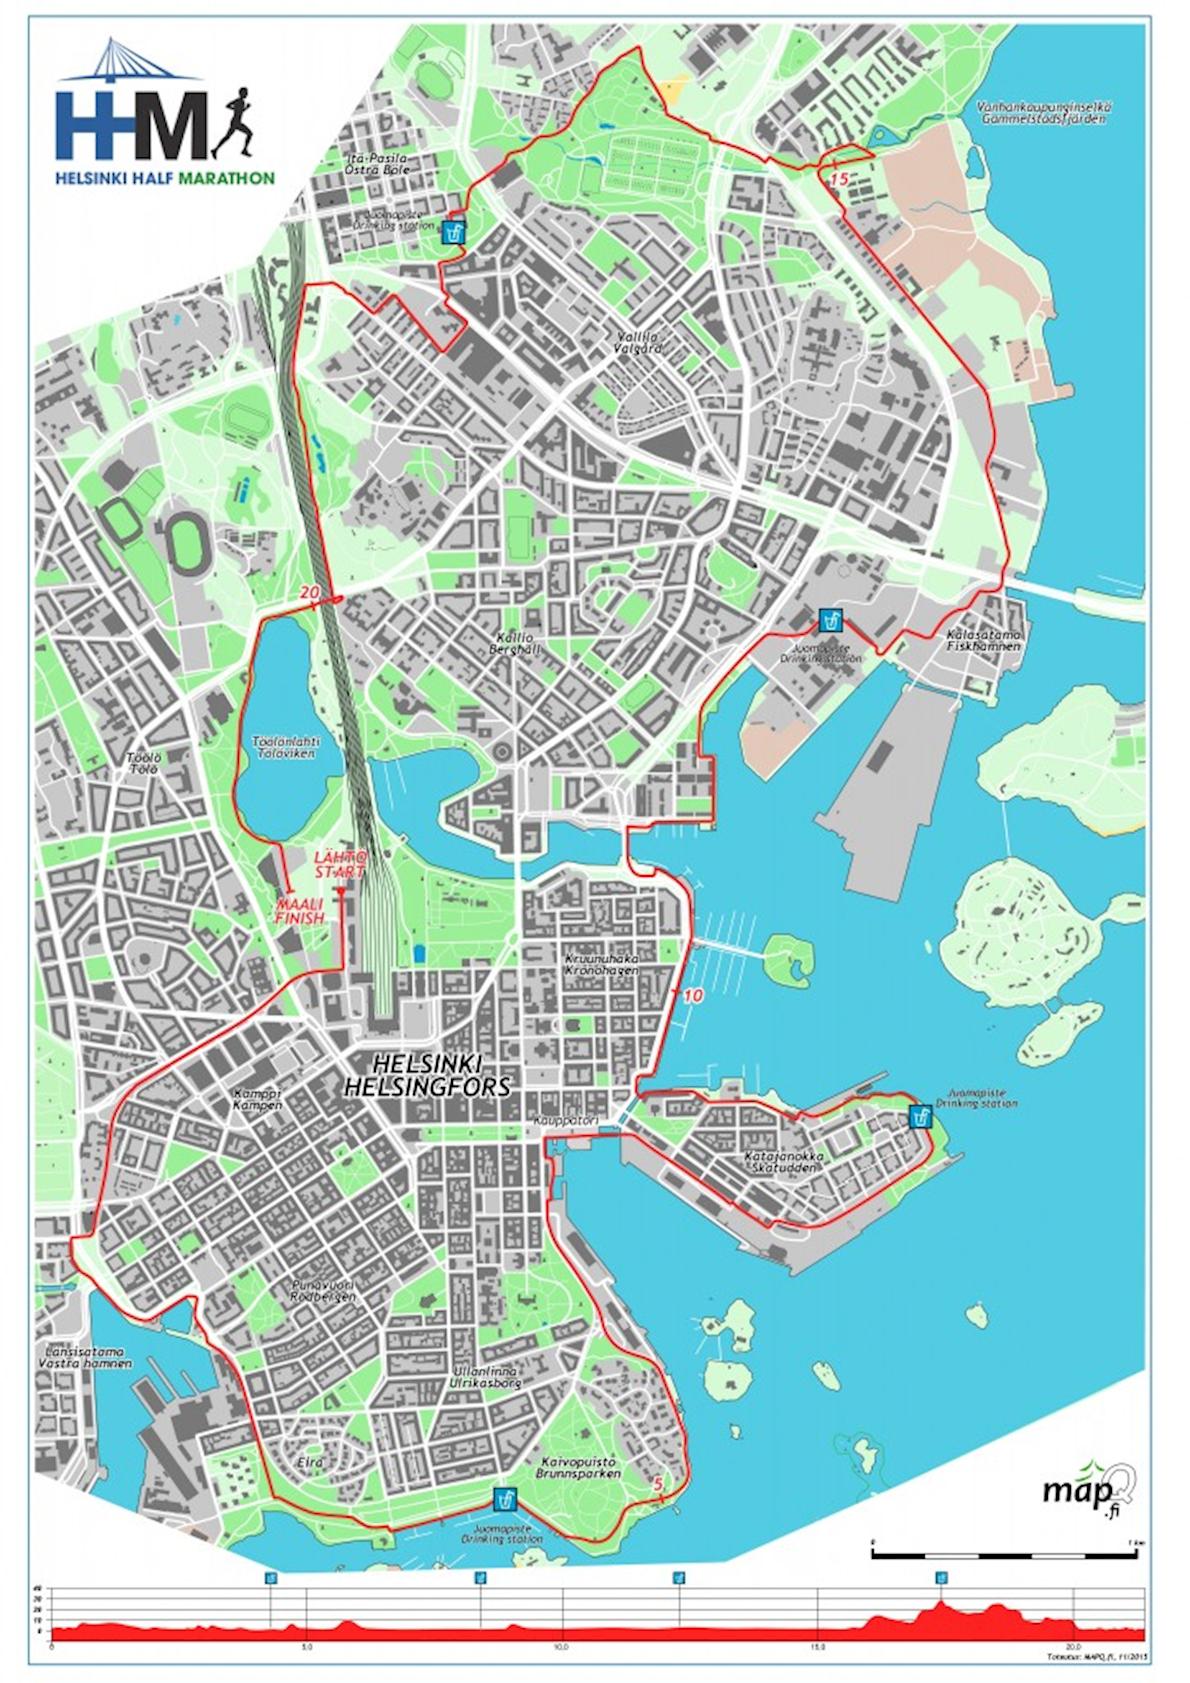 Helsinki Half Marathon Route Map